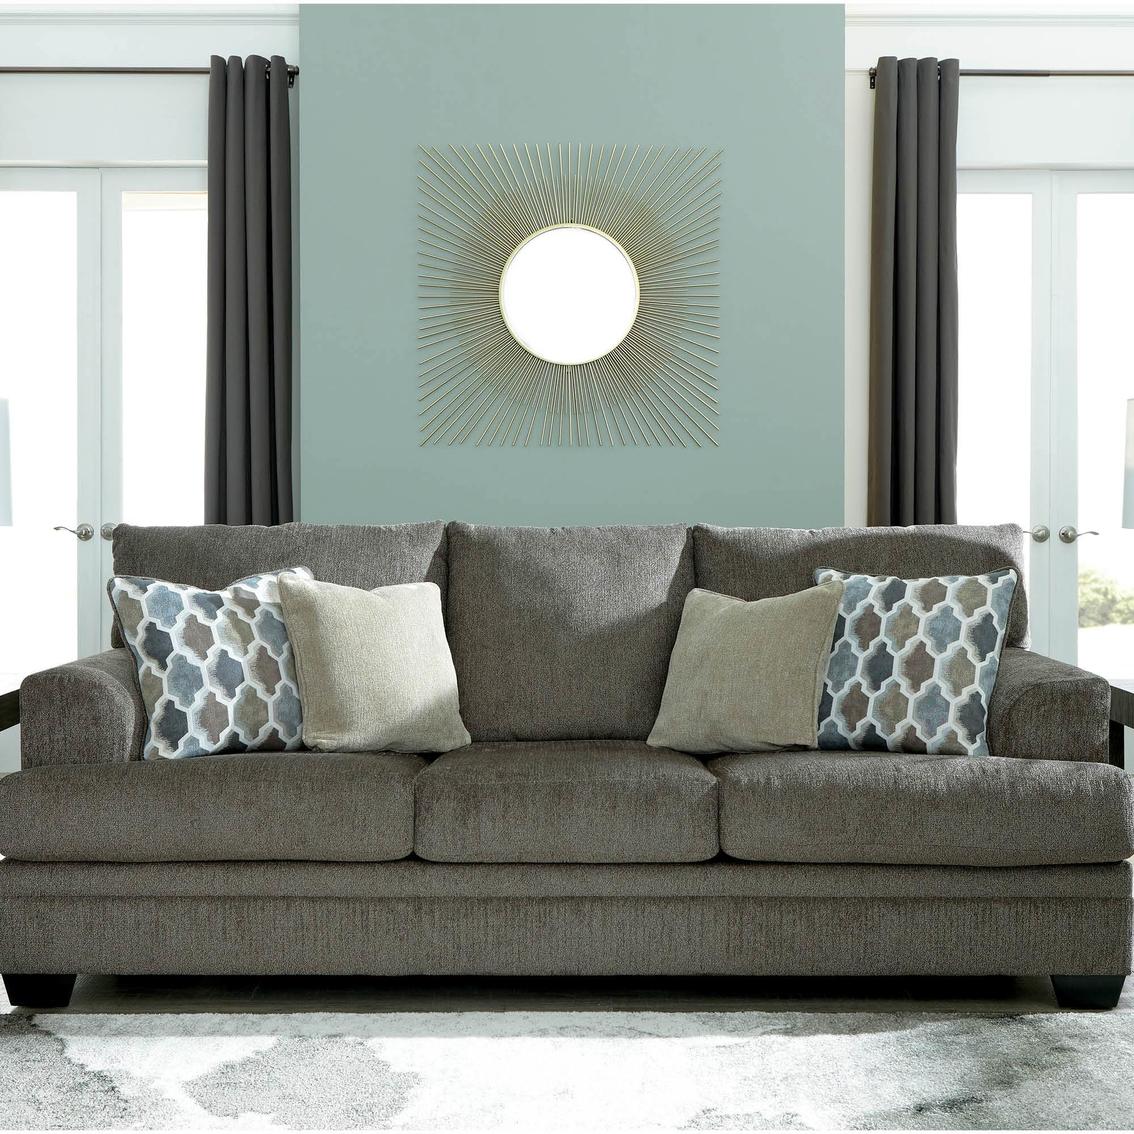 Signature Design By Ashley Dorsten Sofa Sofas Couches Home